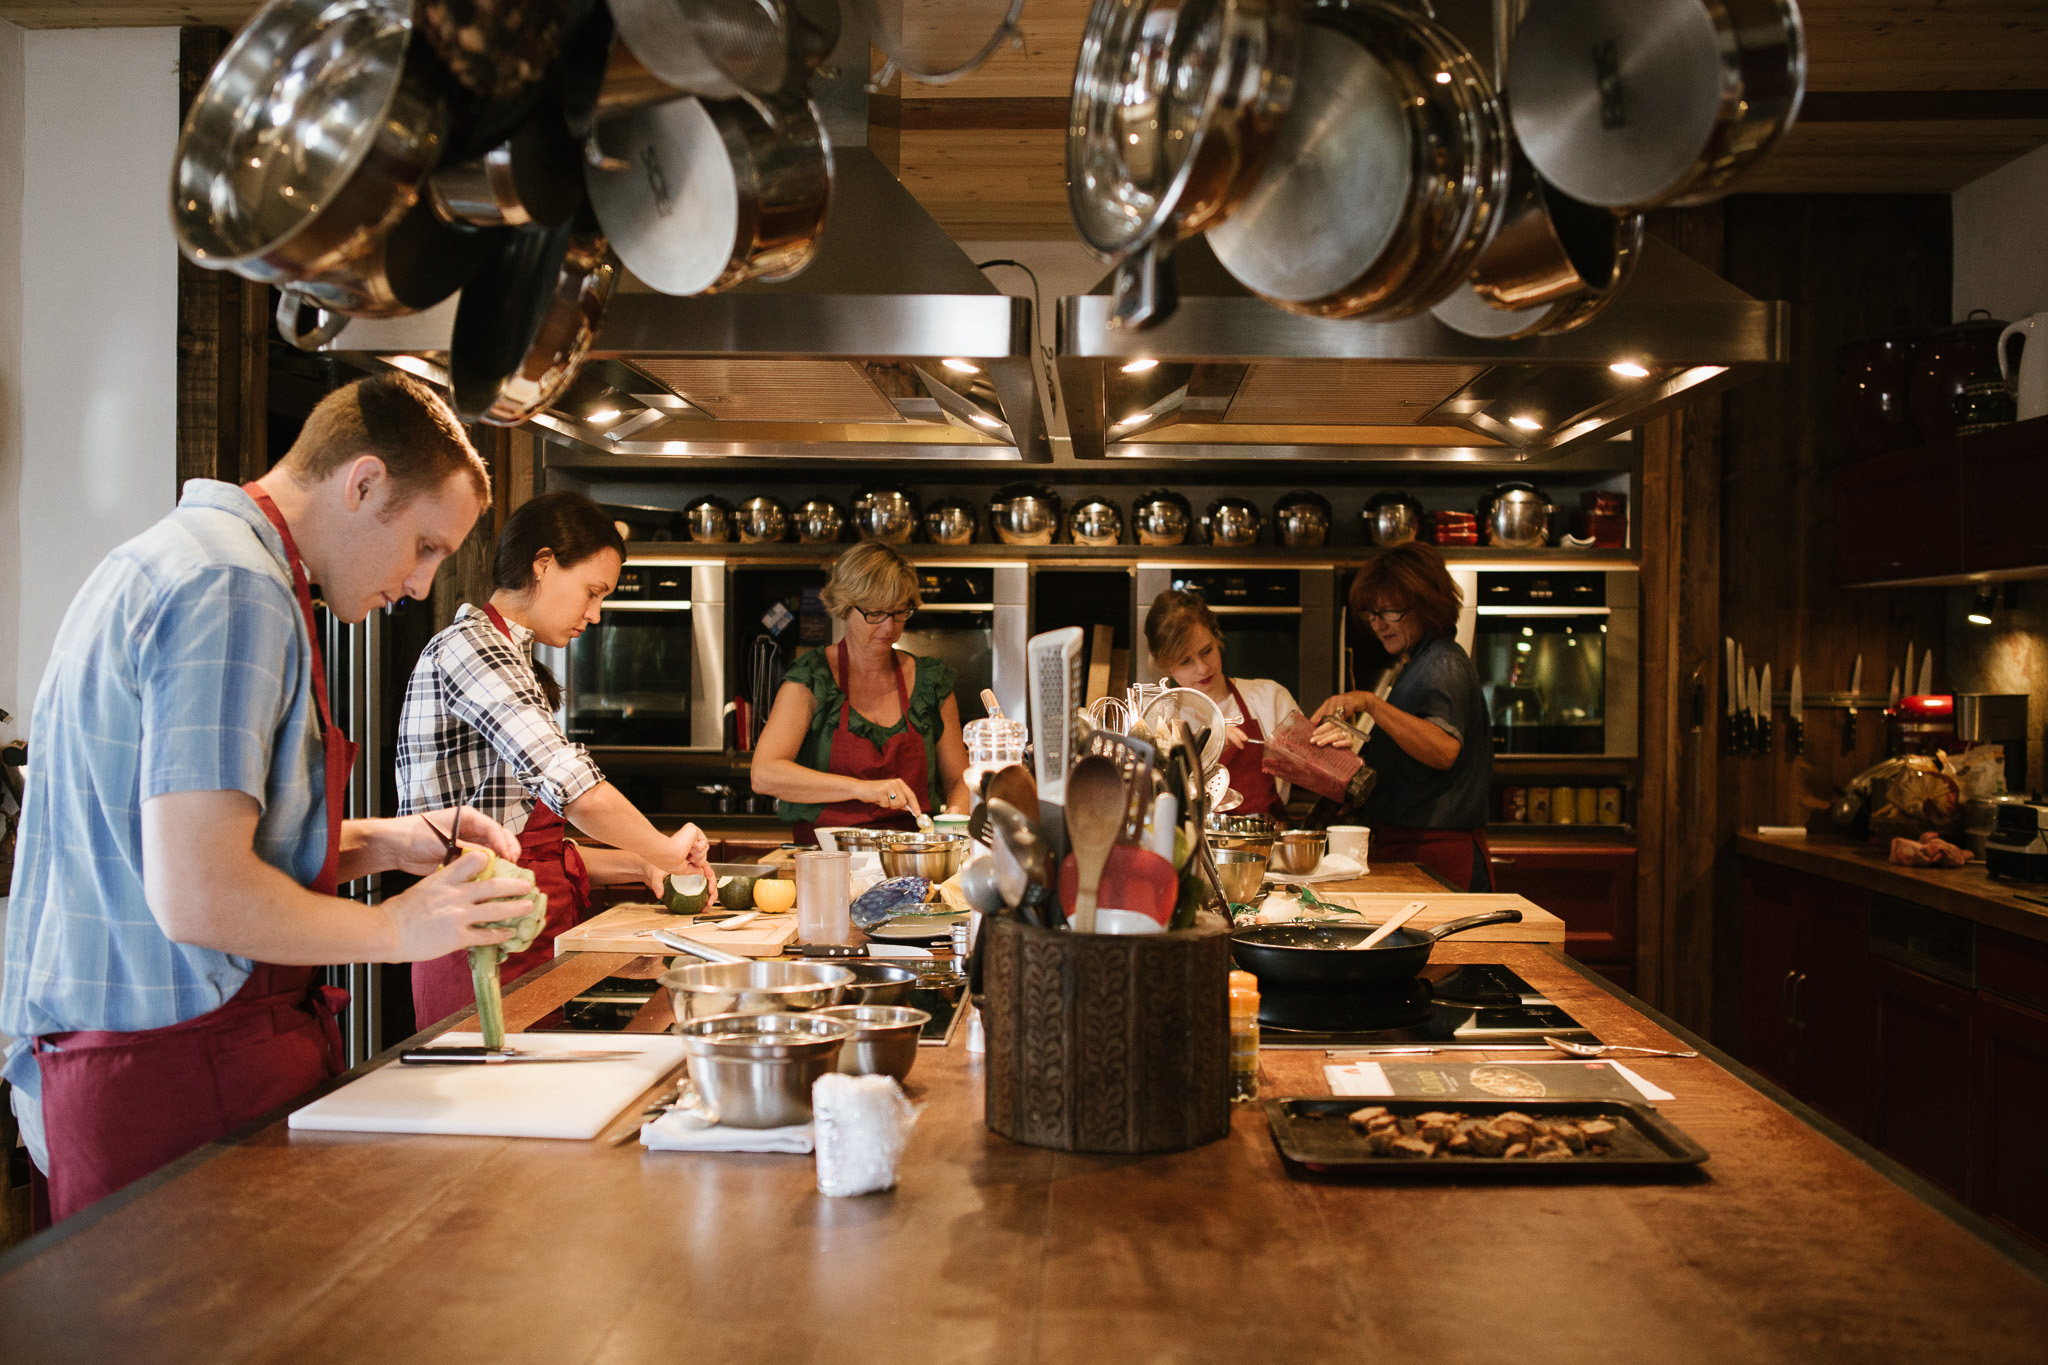 Cookery School Chalet Savoie Faire